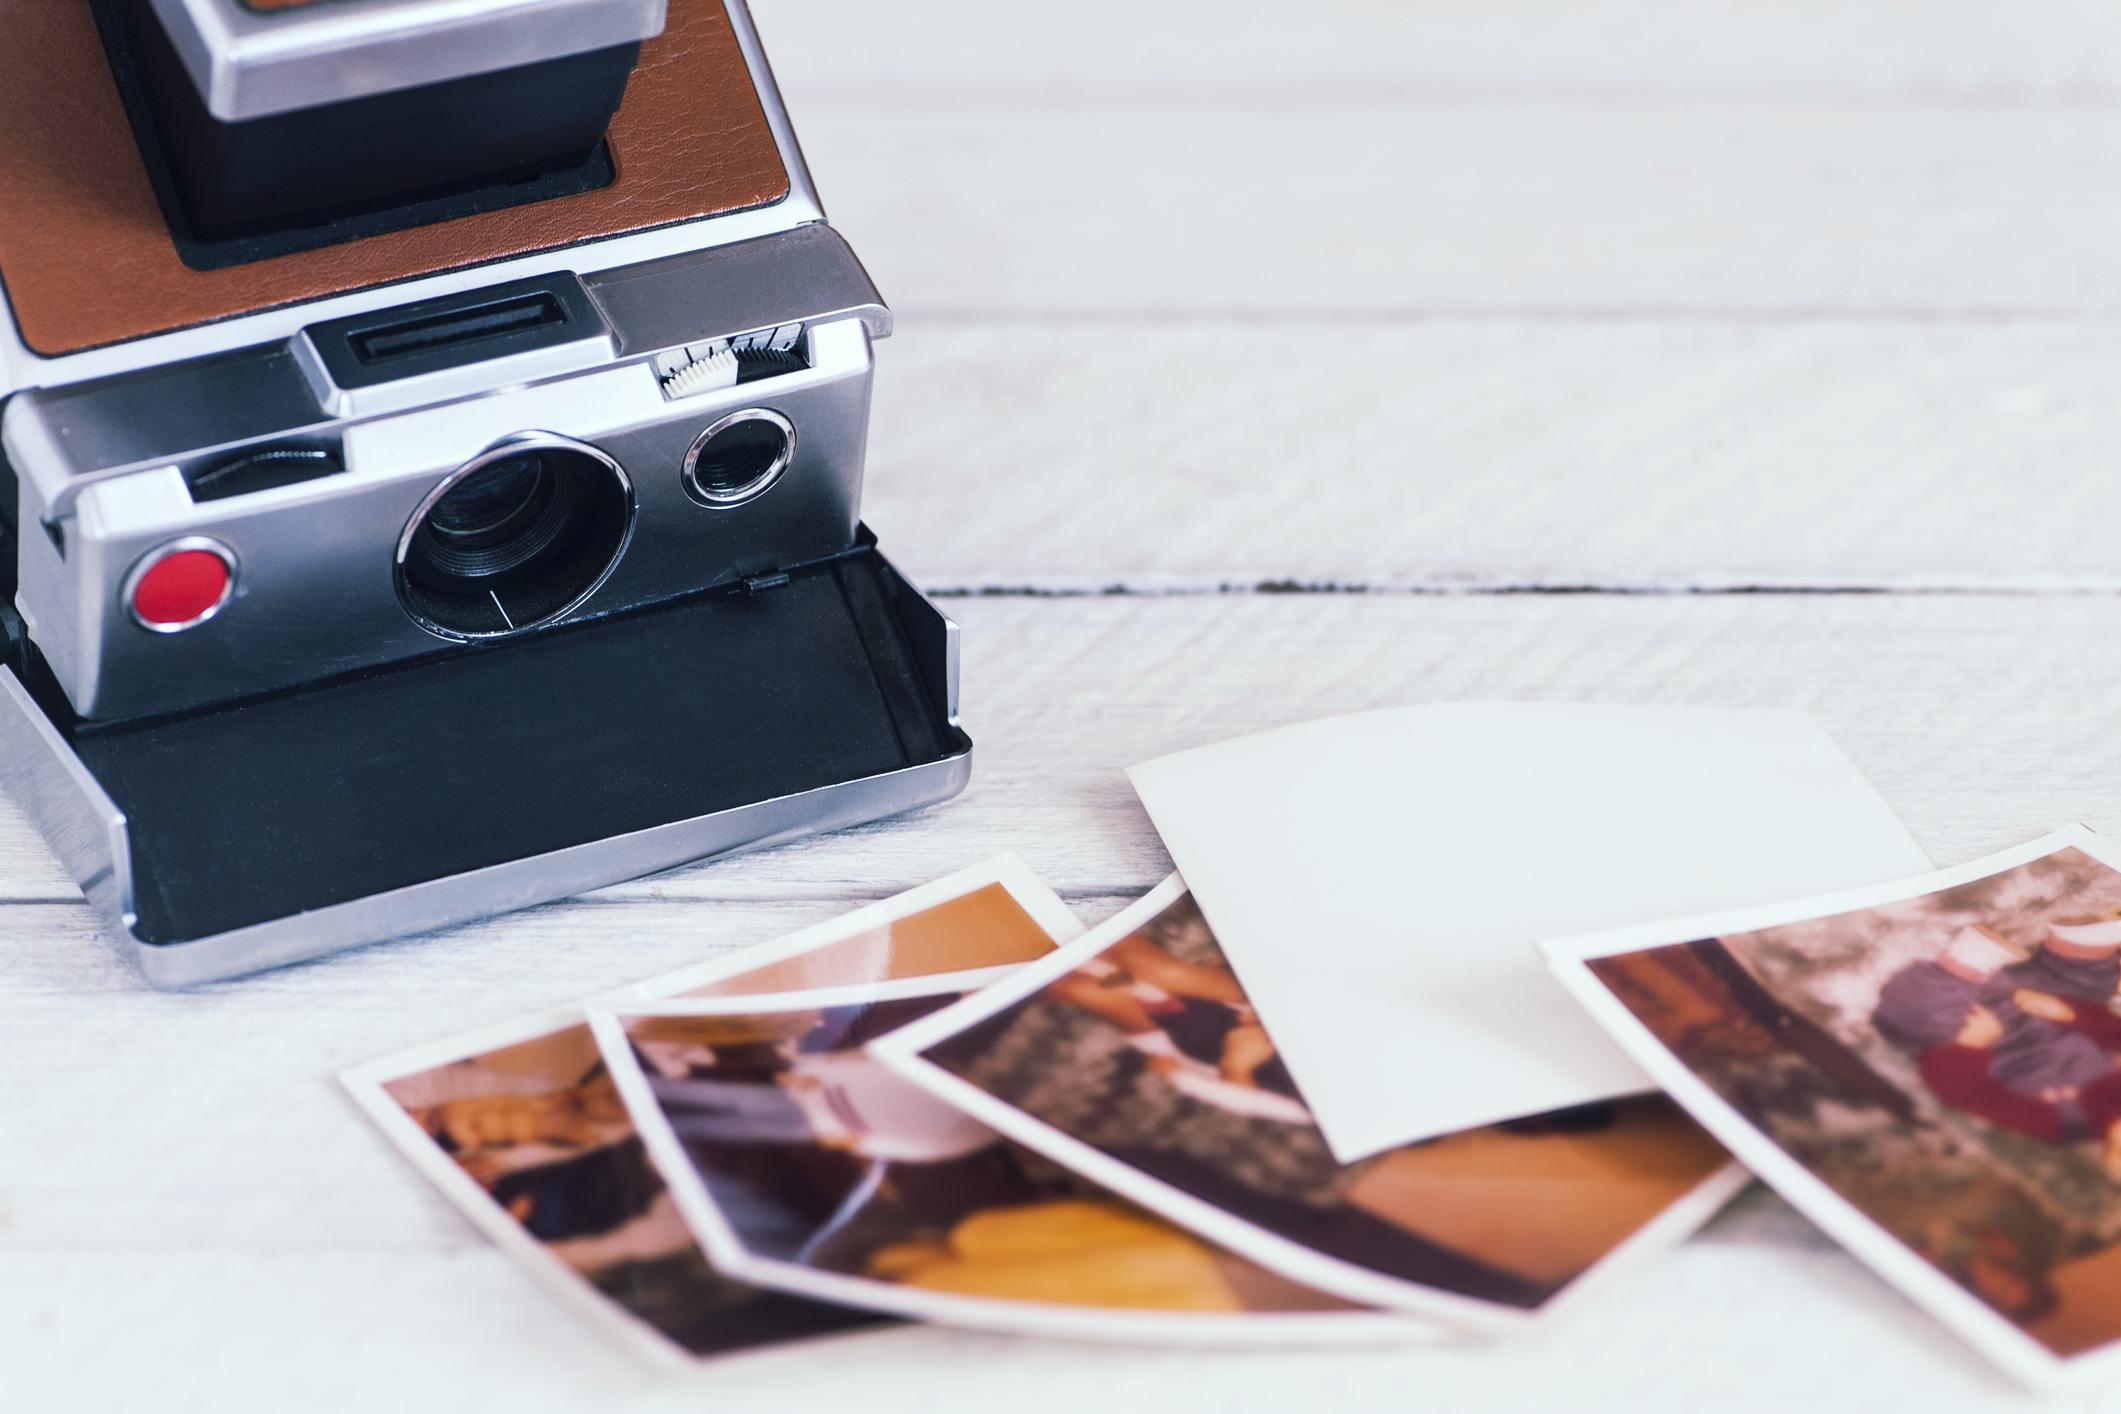 Polaroid camera with photos